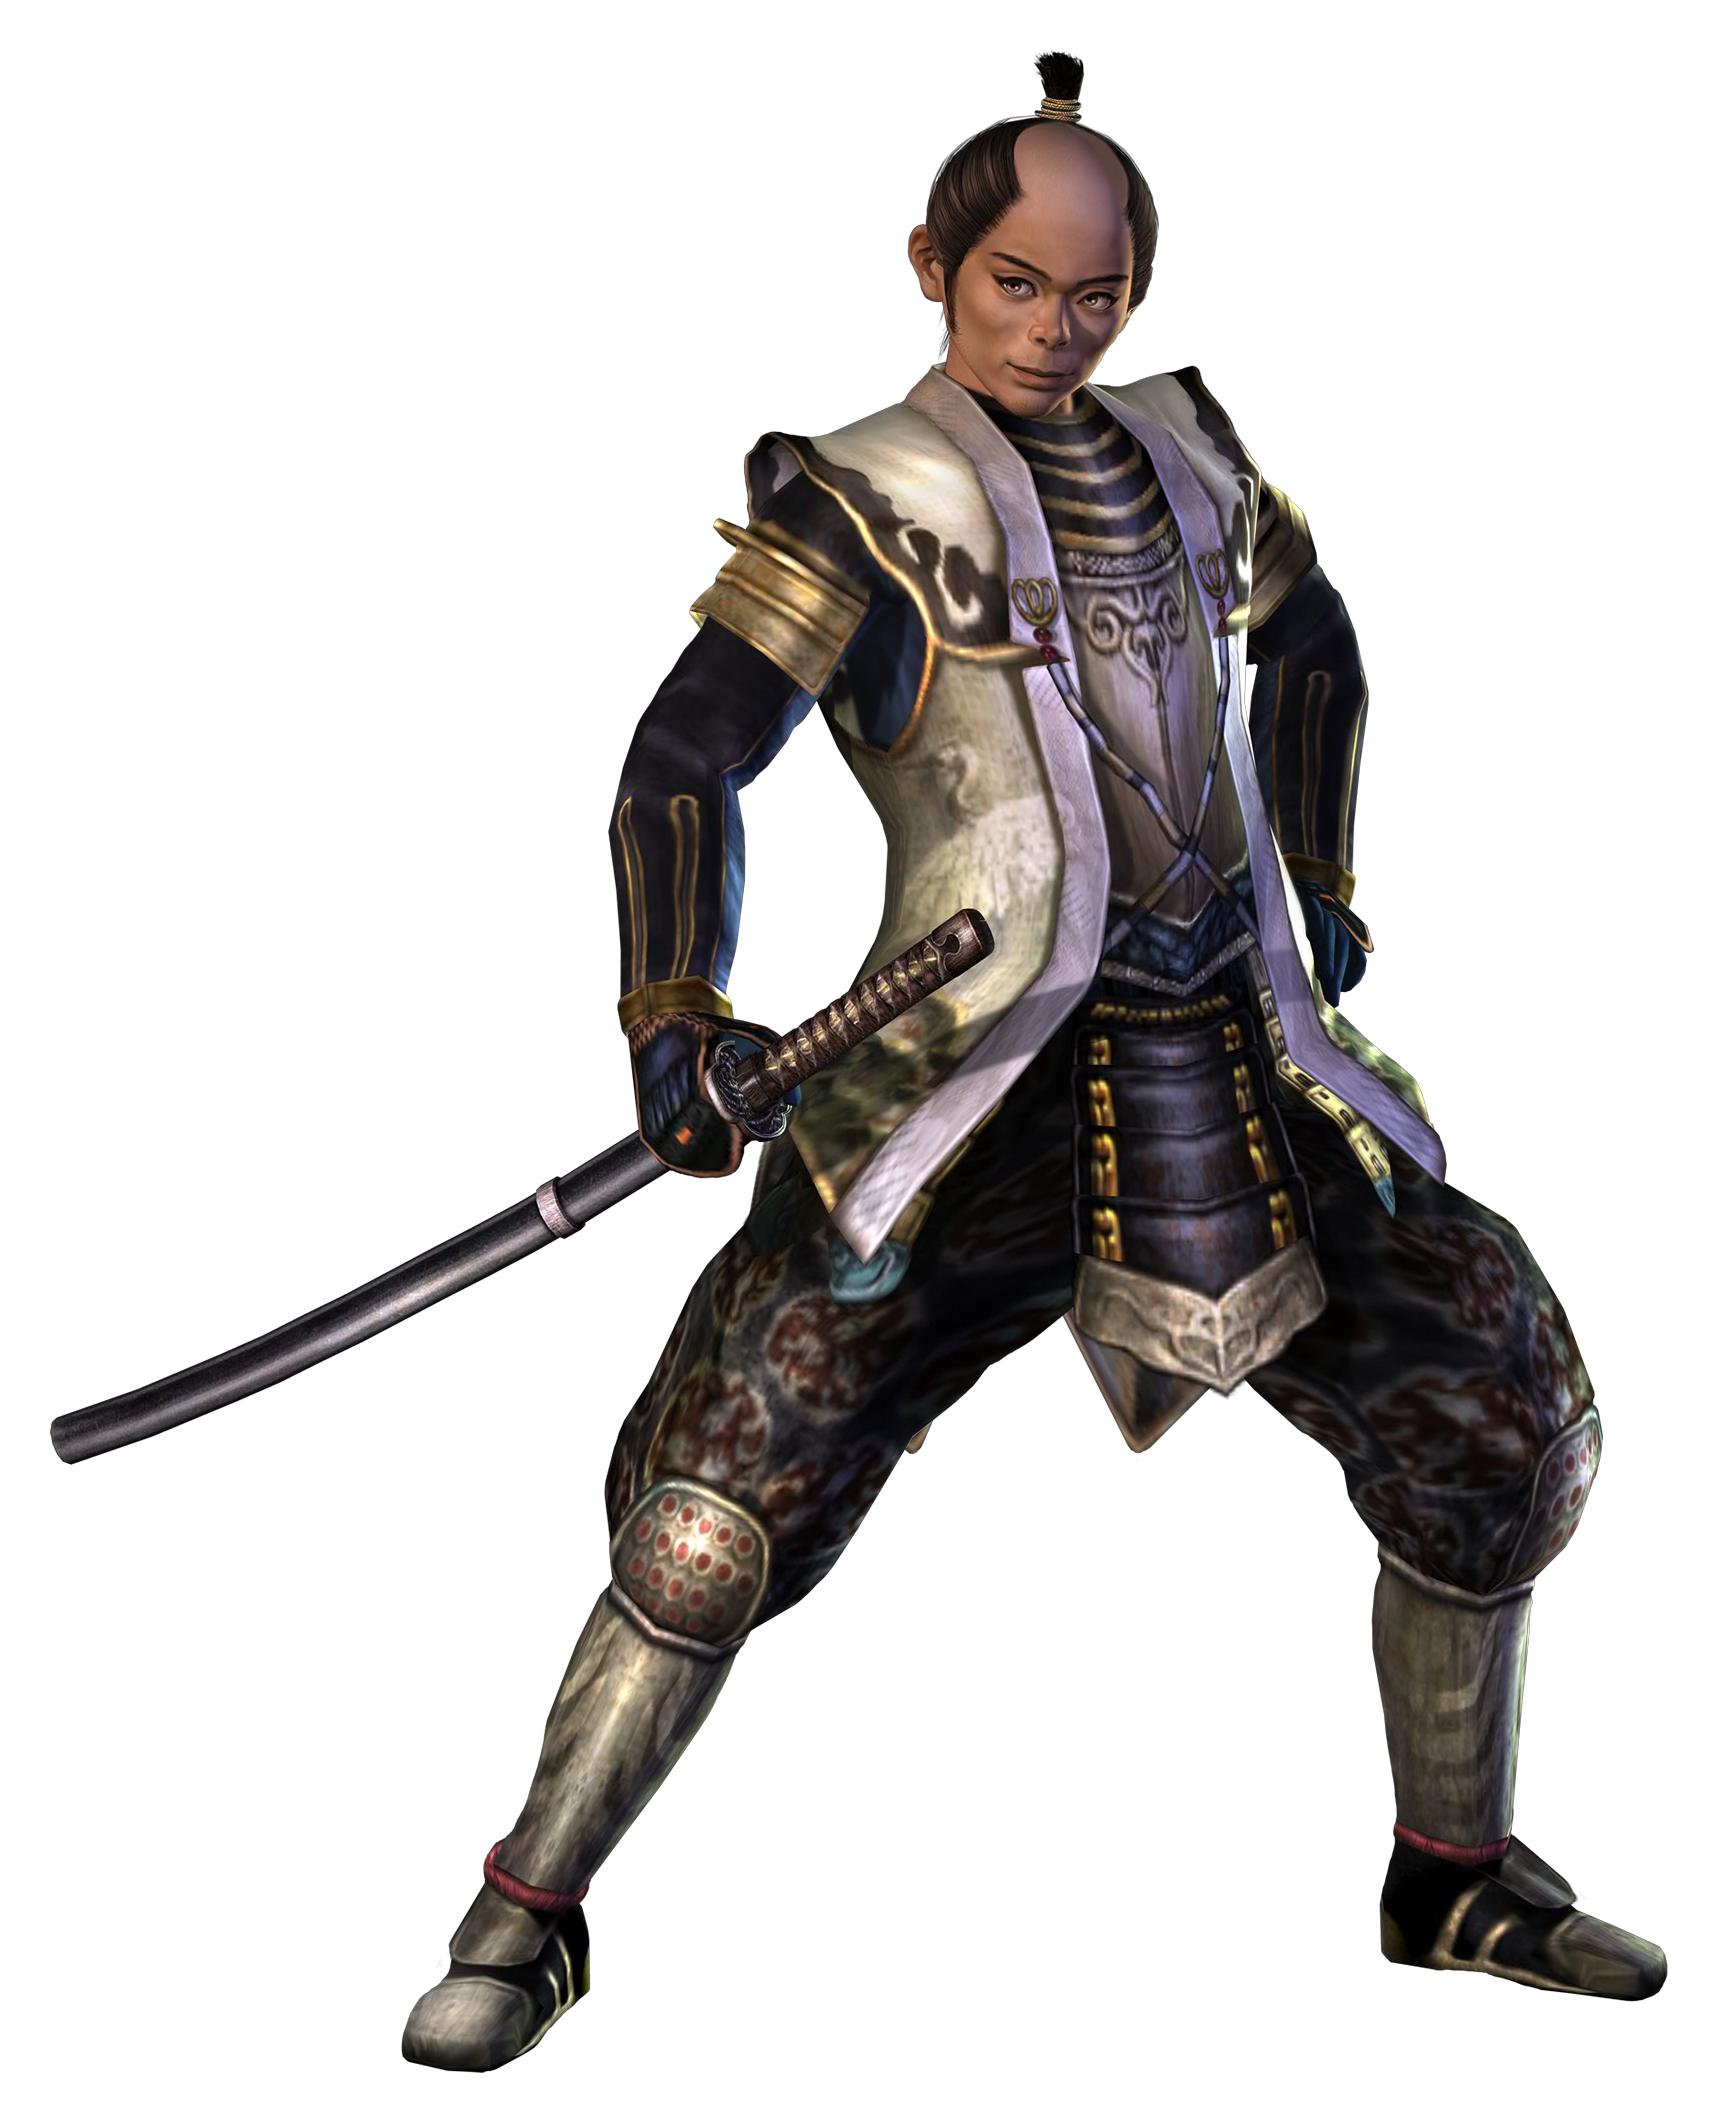 Warriors Orochi 3 9 Tails: Image - Hideyoshi-kessenIII.jpg